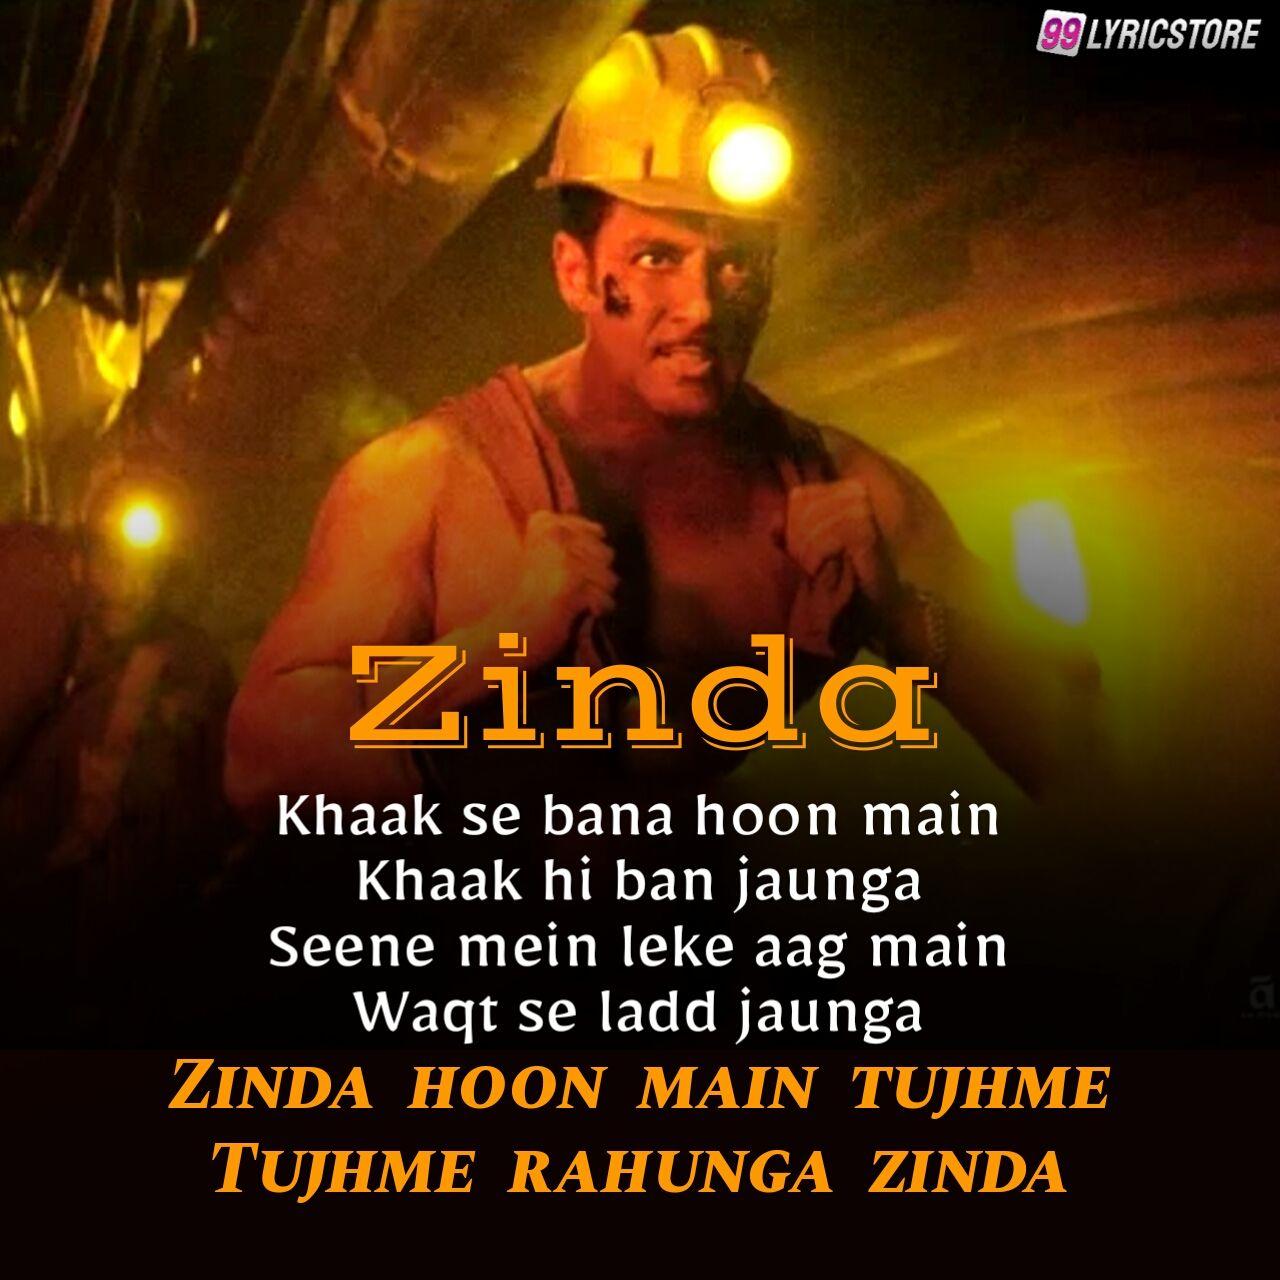 Zinda Hindi Songs Lyrics from movie Bharat sung by Vishal Dadlani